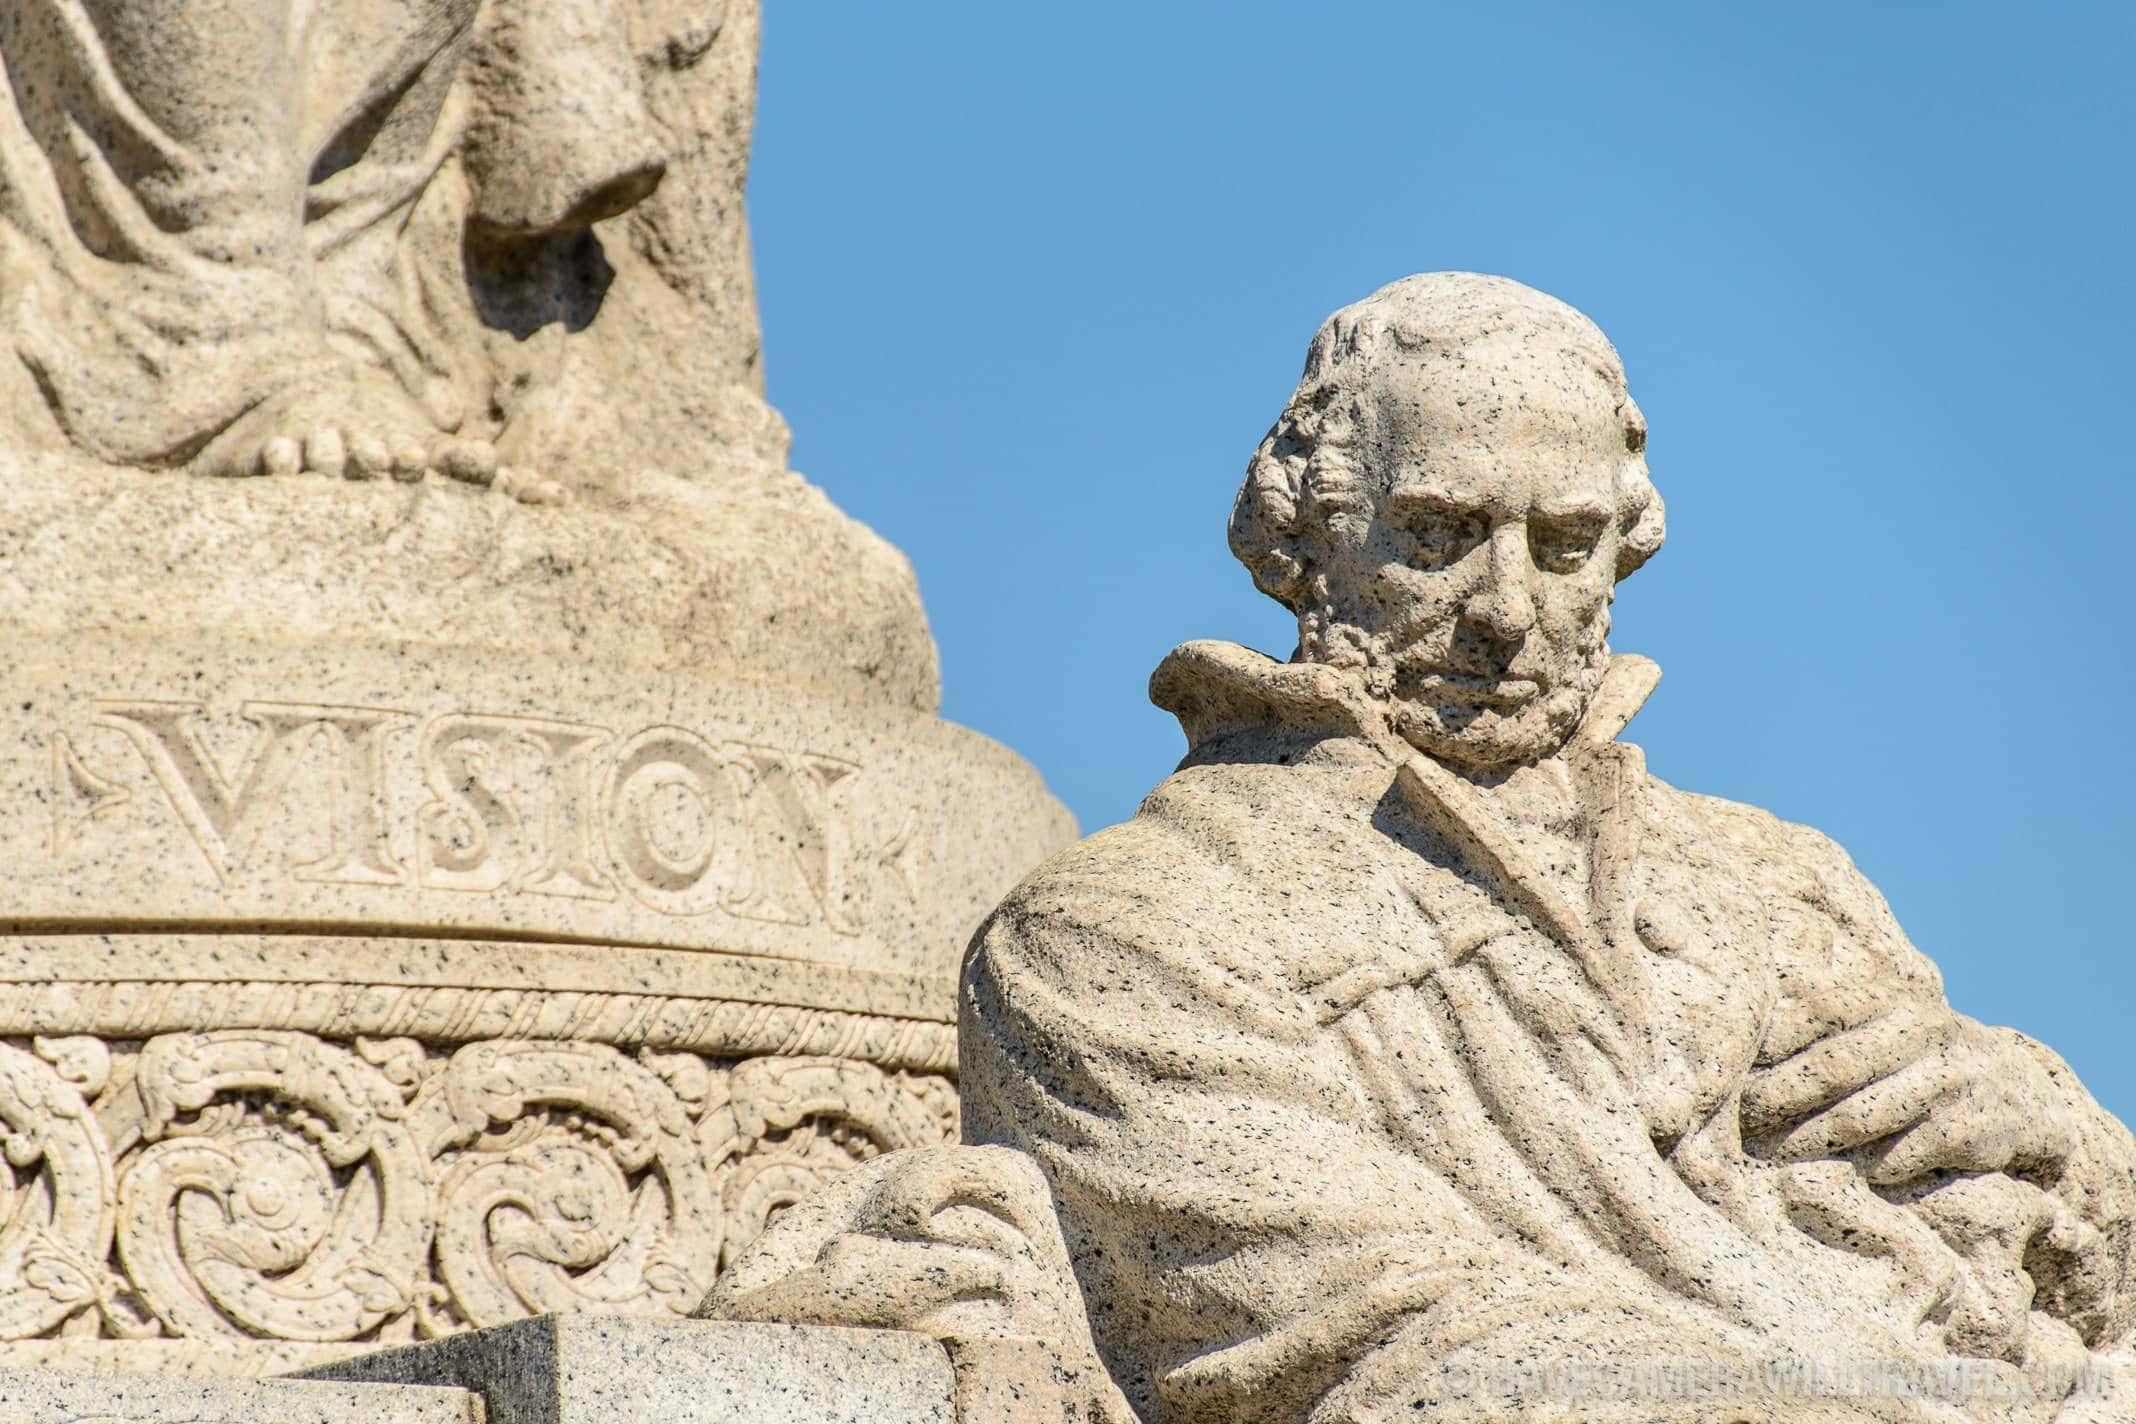 184-133428159 John Ericsson National Memorial with Vision Inscription.